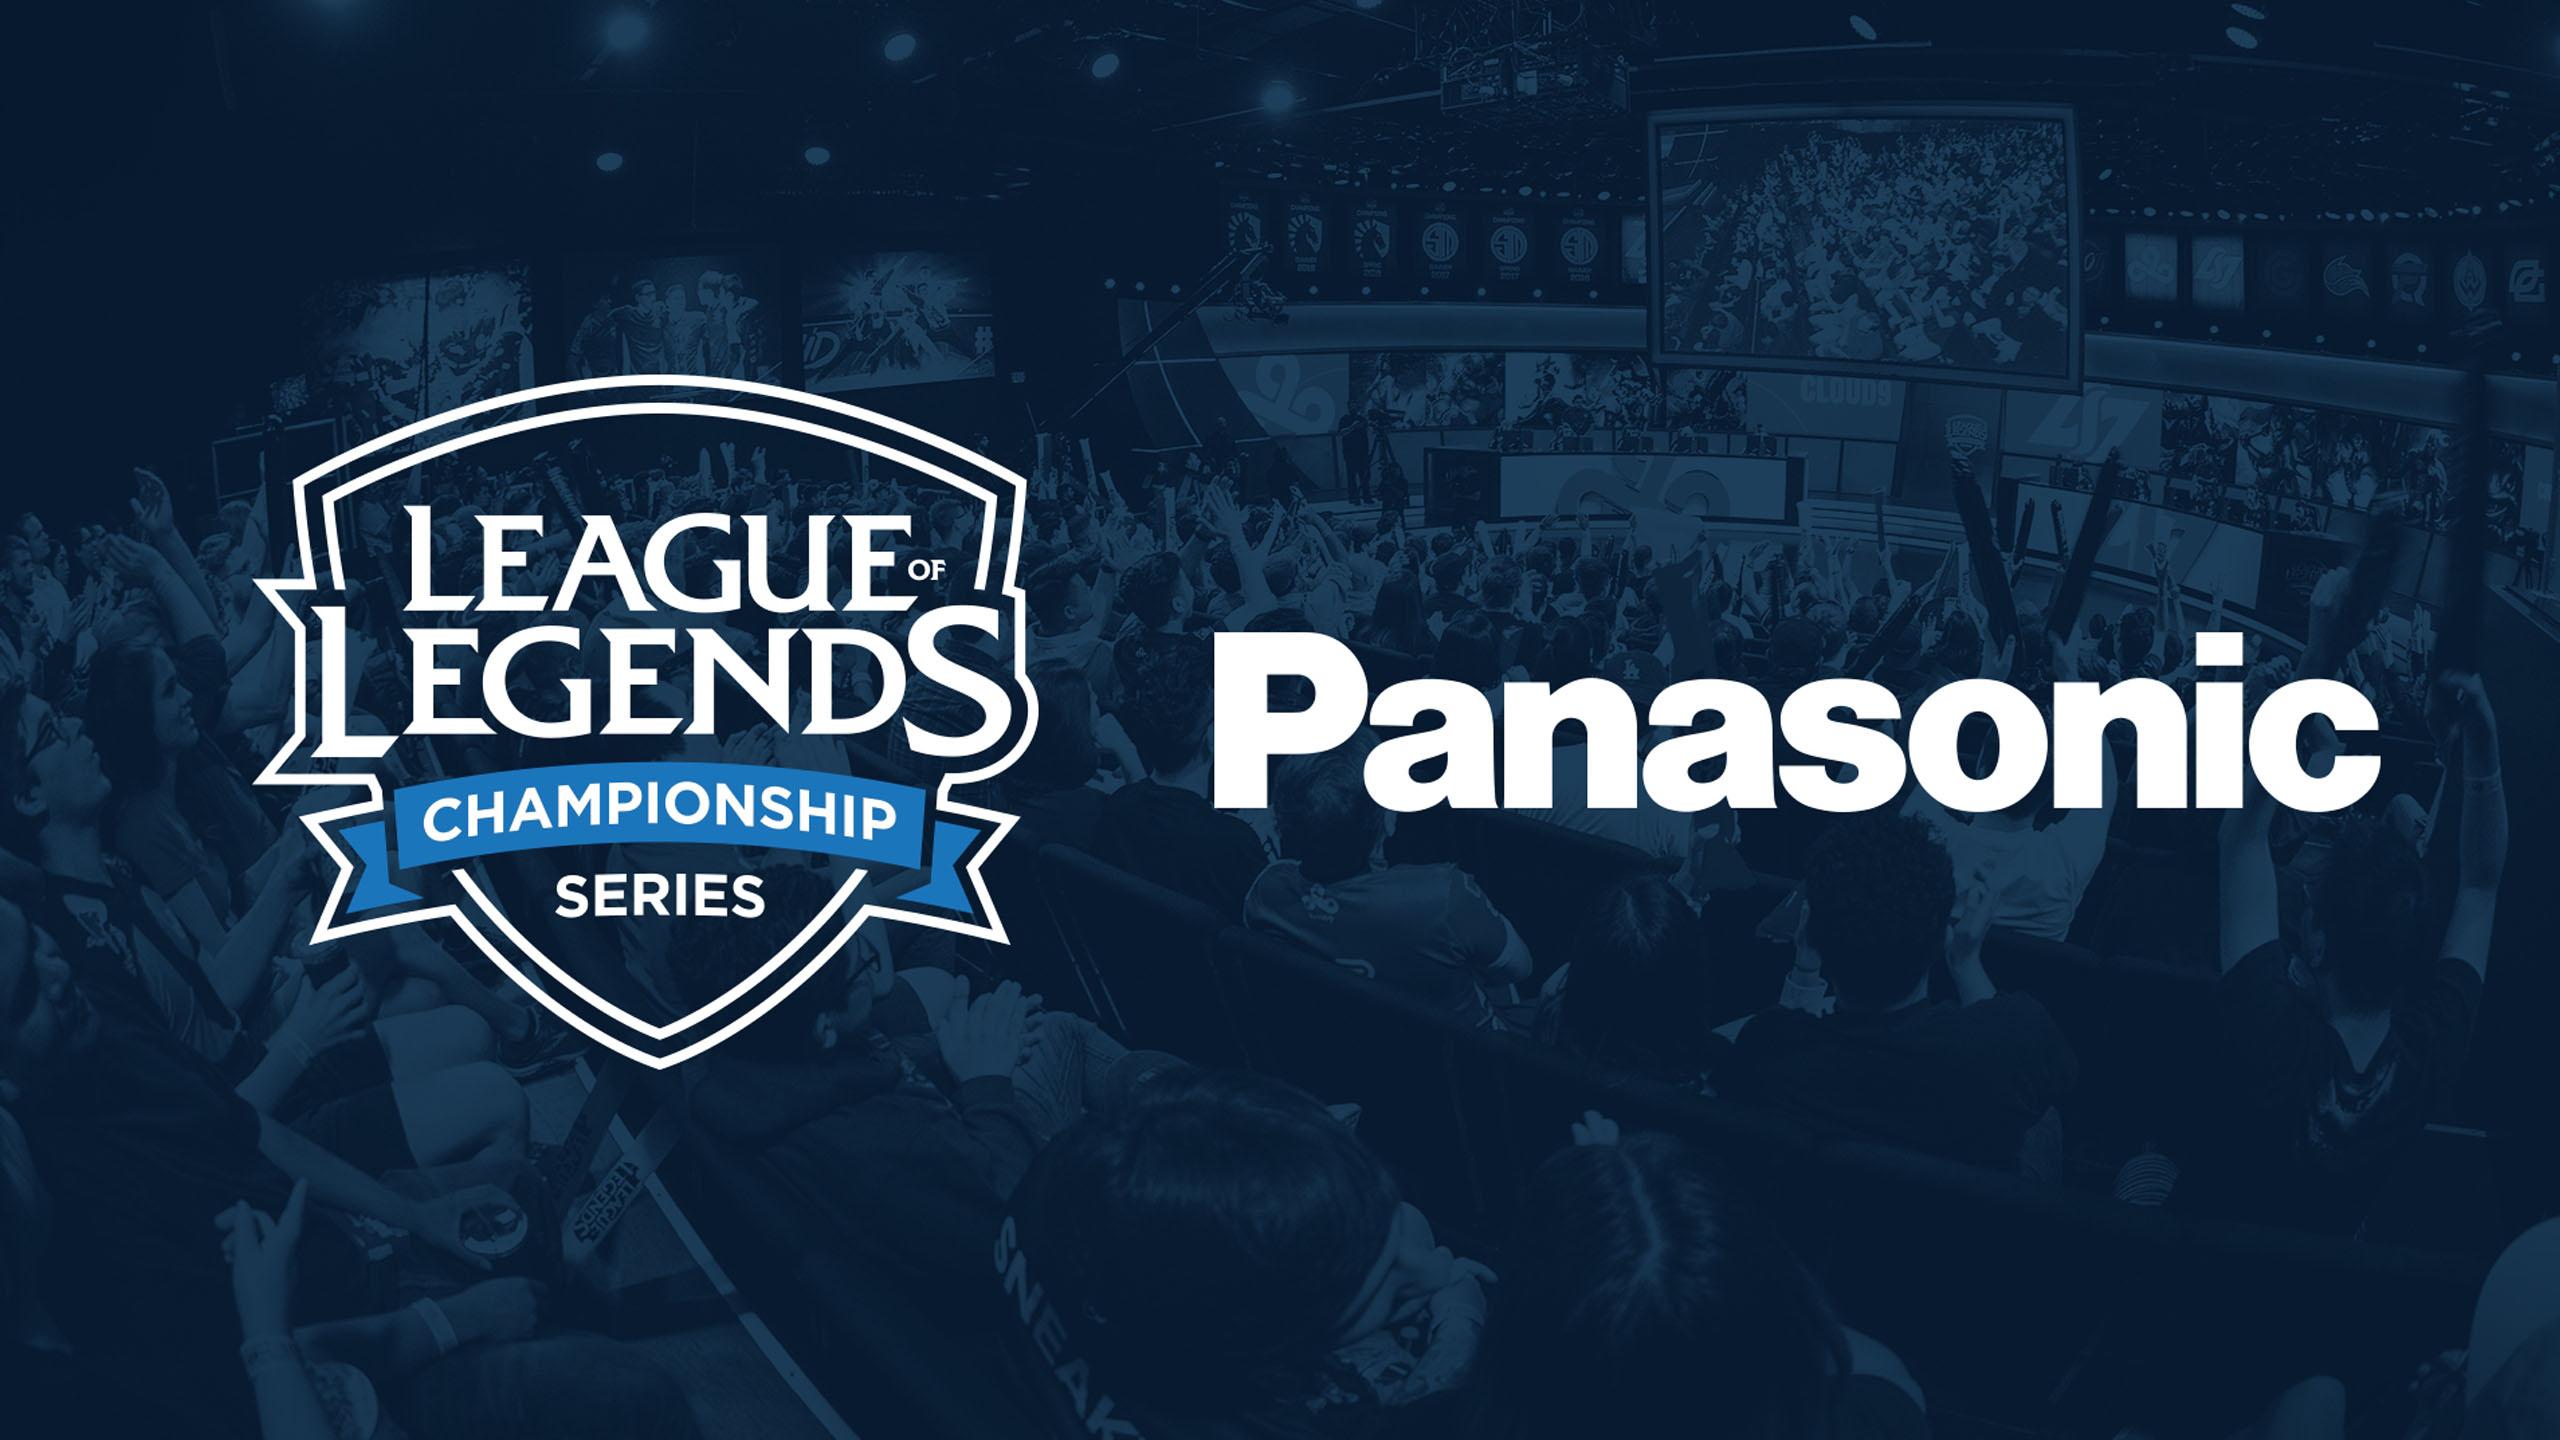 League Of Legends Takes Flight With Panasonic Avionics